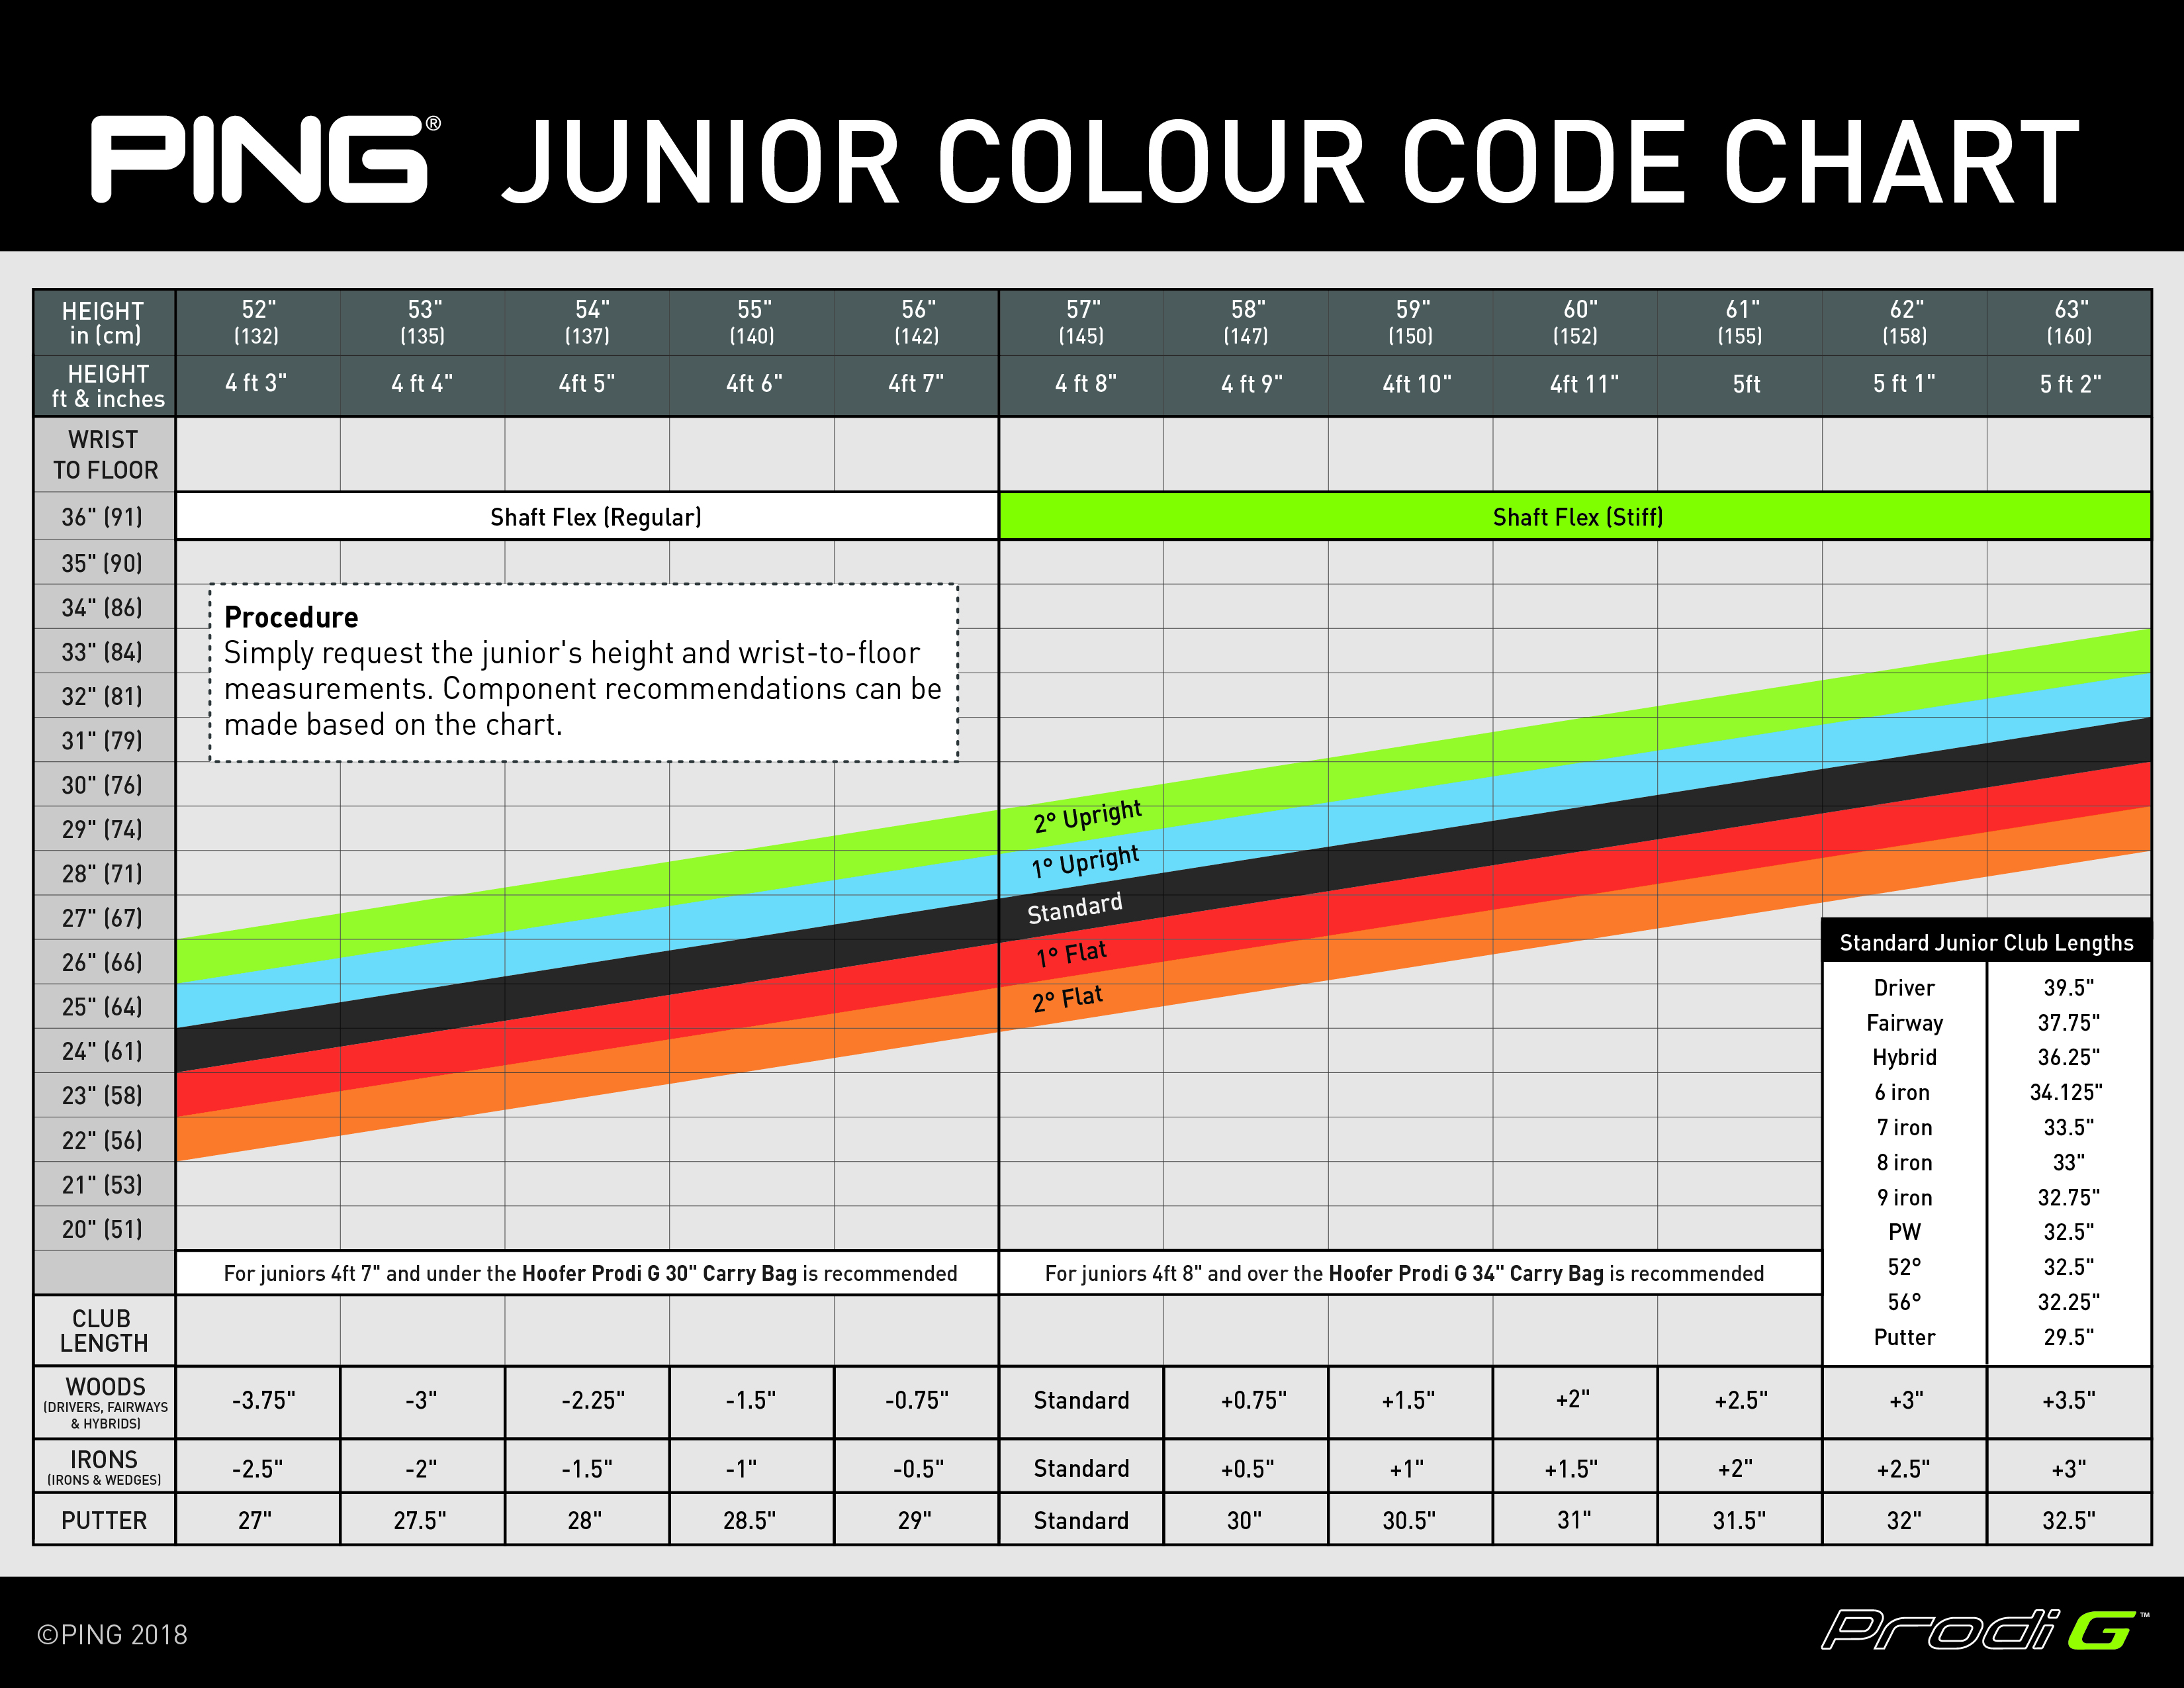 Ping Prodi G Color code